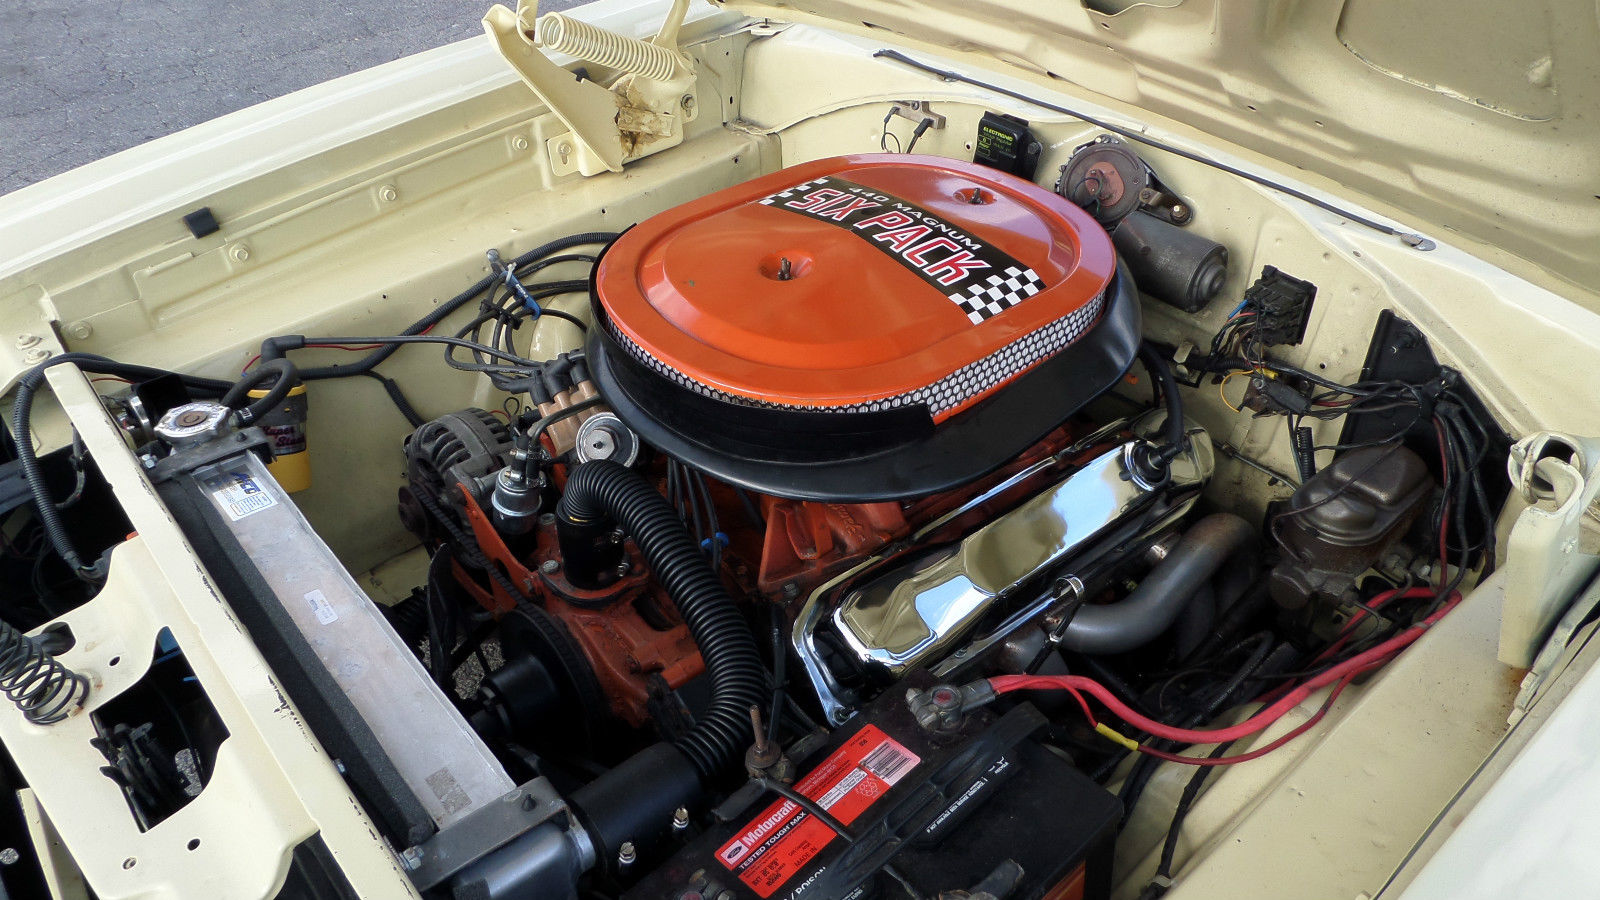 1970 Dodge Coronet SUPER BEE 440 SIX PACK - Muscle Car